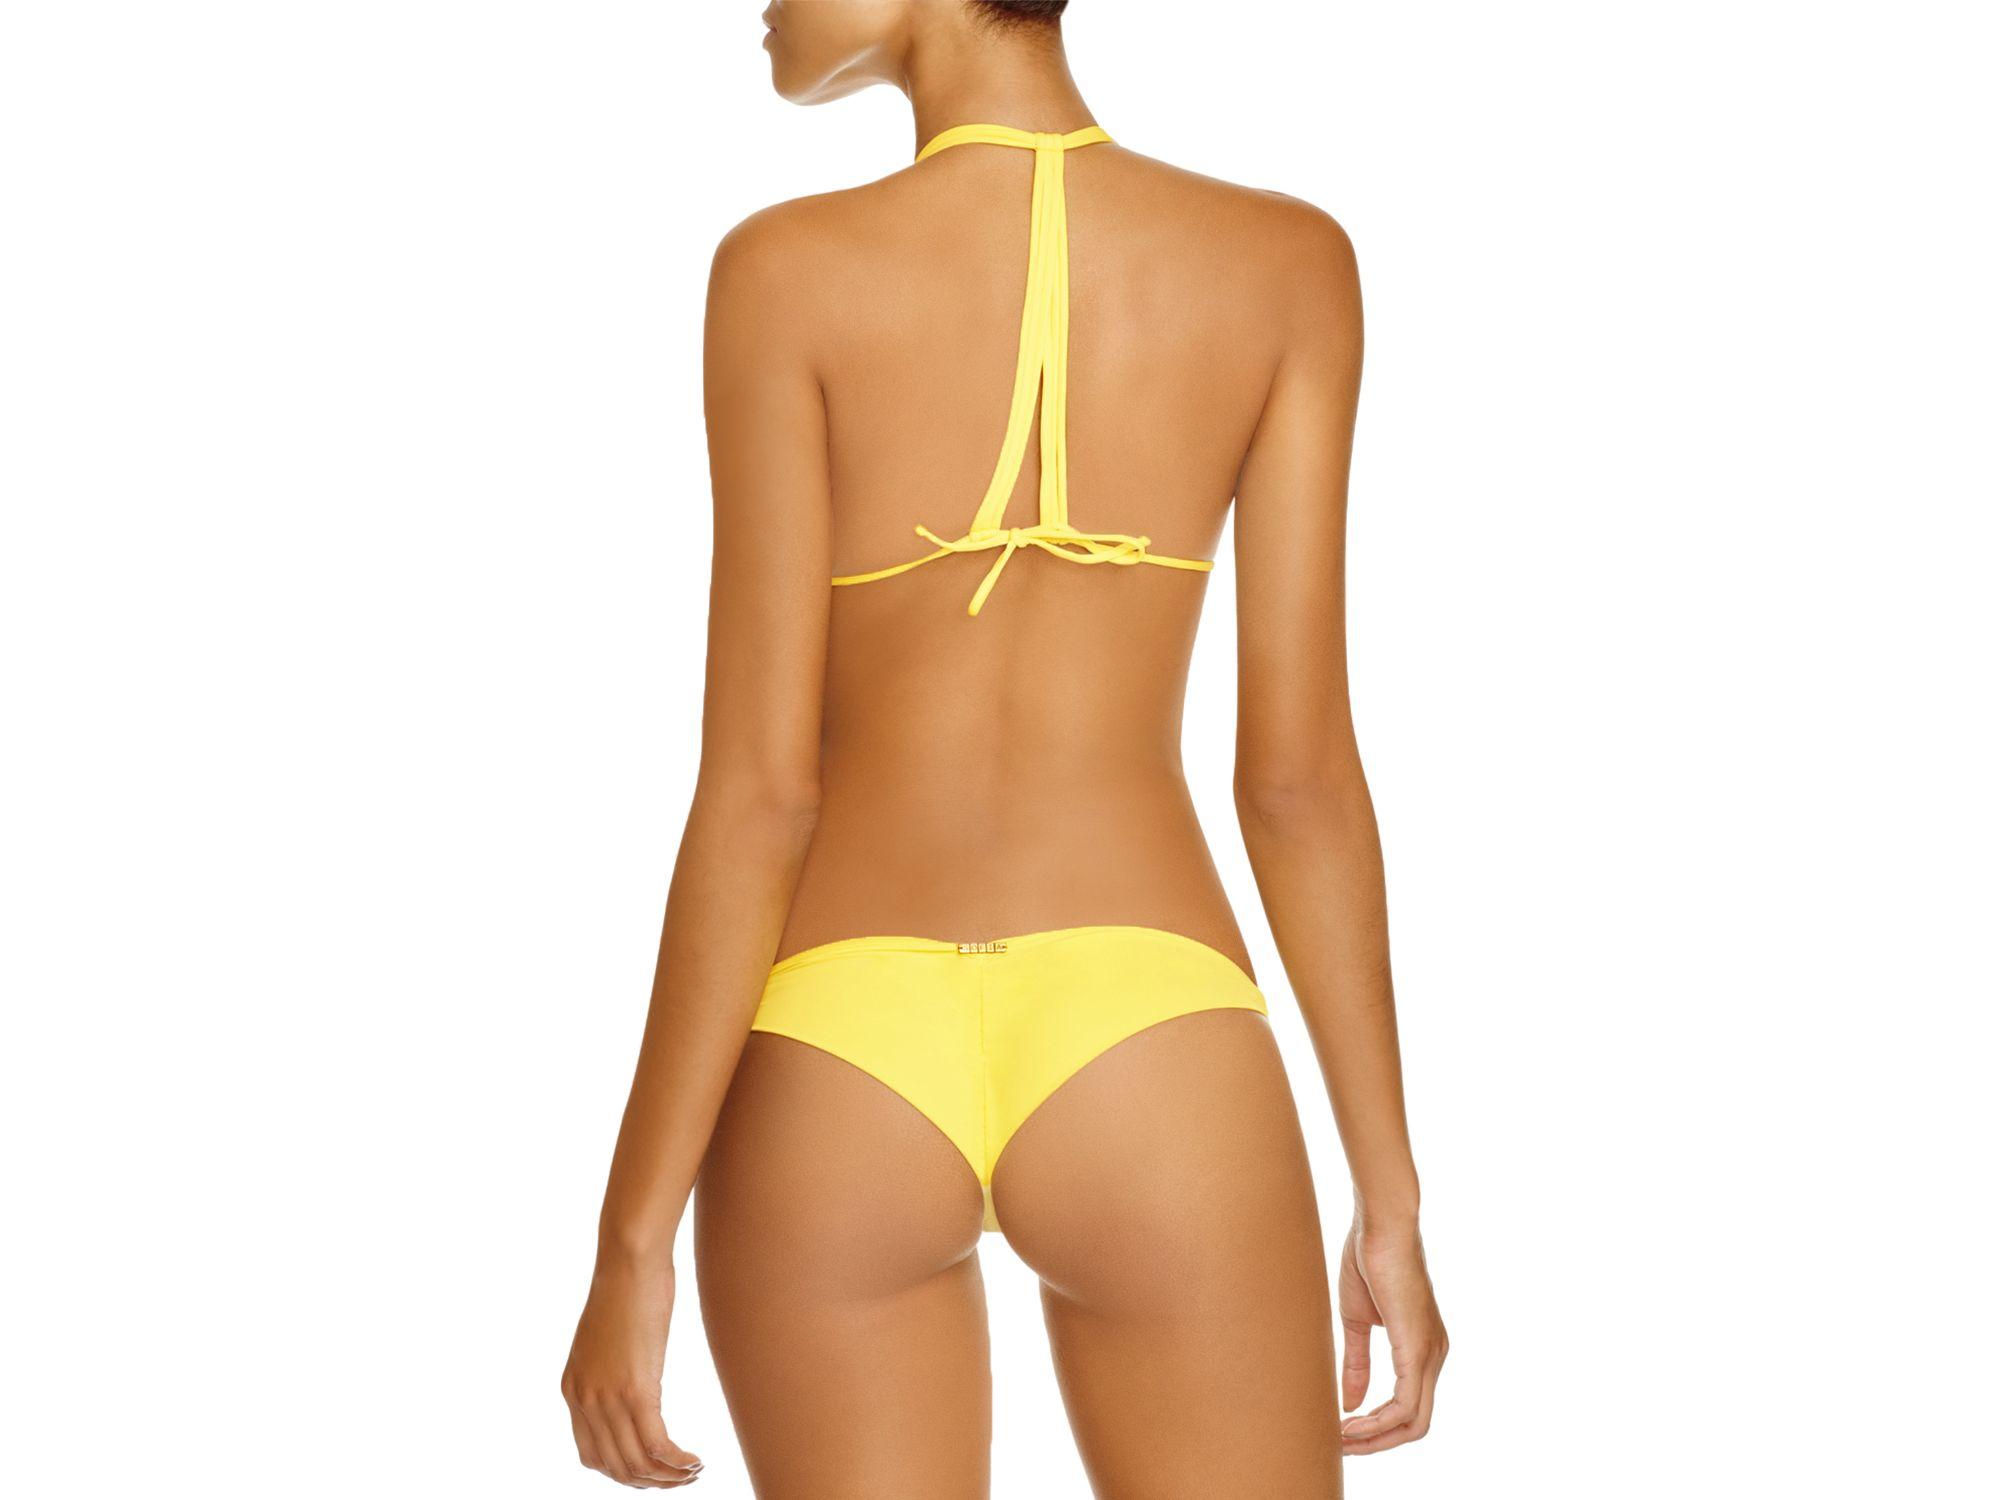 a0bf08016b222 Lyst - Sofia By Vix Sunrise Triangle Bikini Top in Yellow